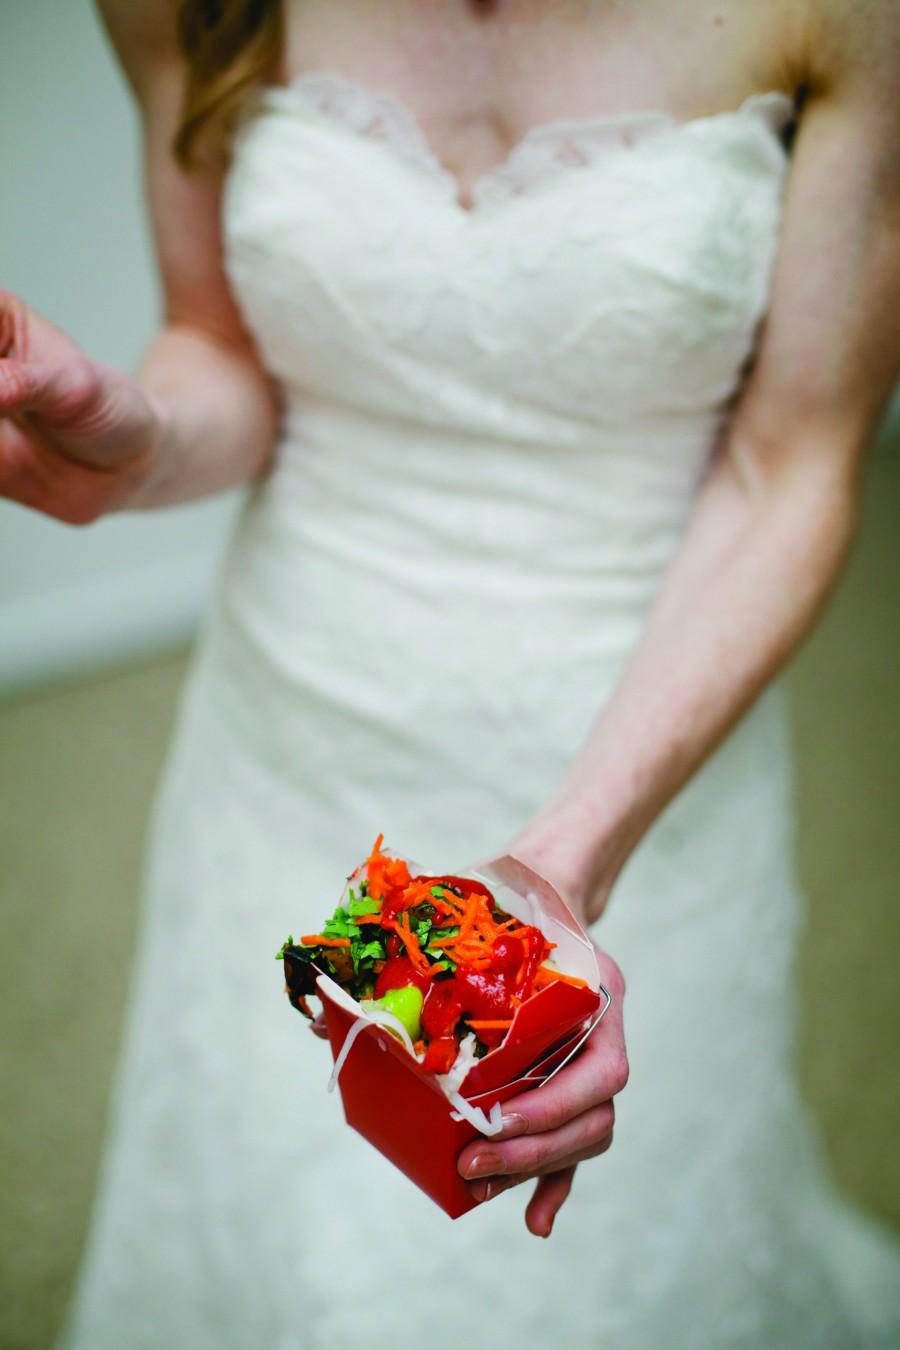 View More: http://jonathangibsonphotography.pass.us/kirsten-nick-wedding